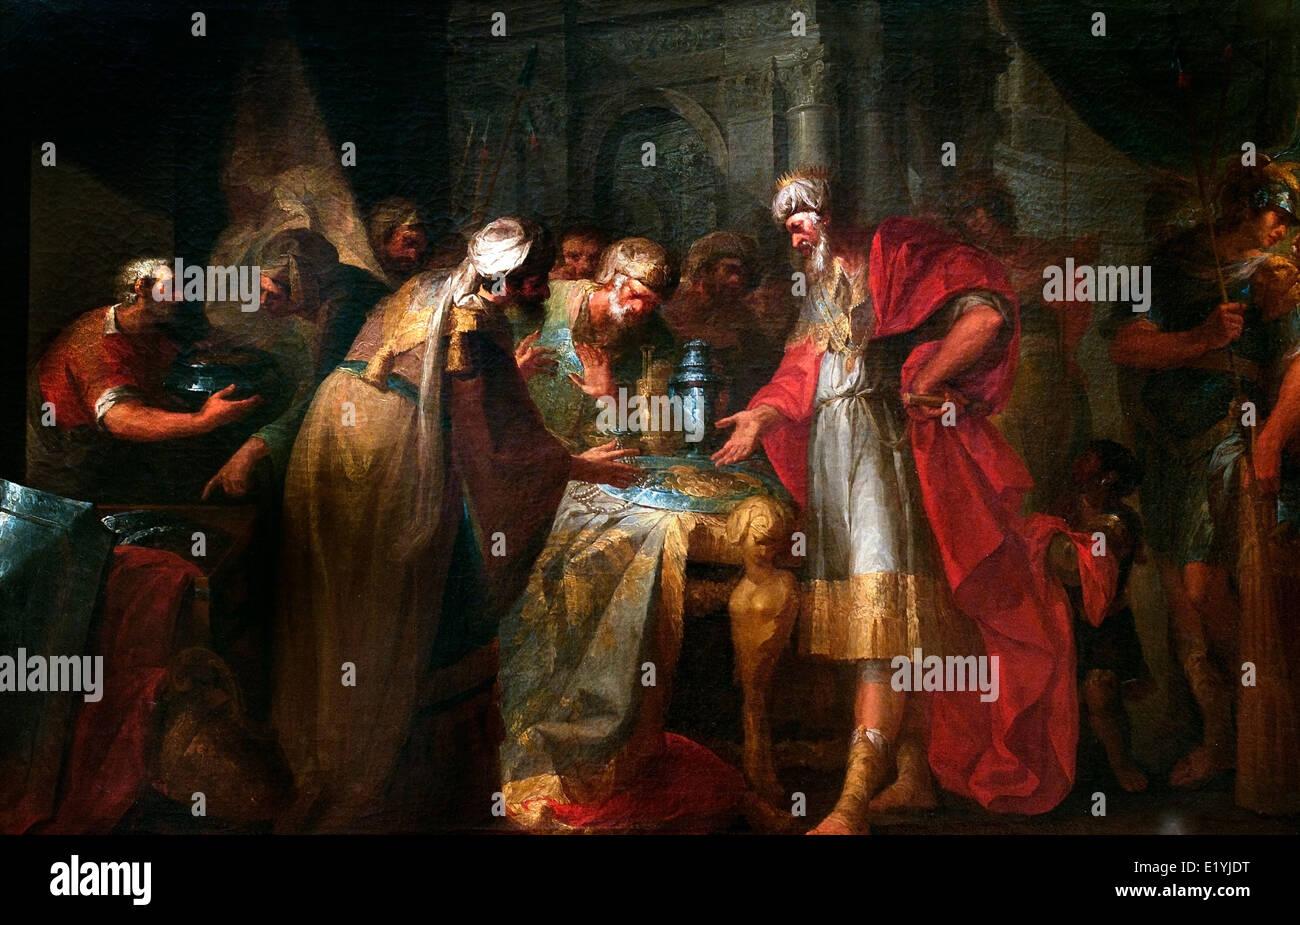 King Hezekiah Parading his Wealth before Abassadors of the King of Babylon 1789 Vicente Lopez Portana 1772-1850 Stock Photo